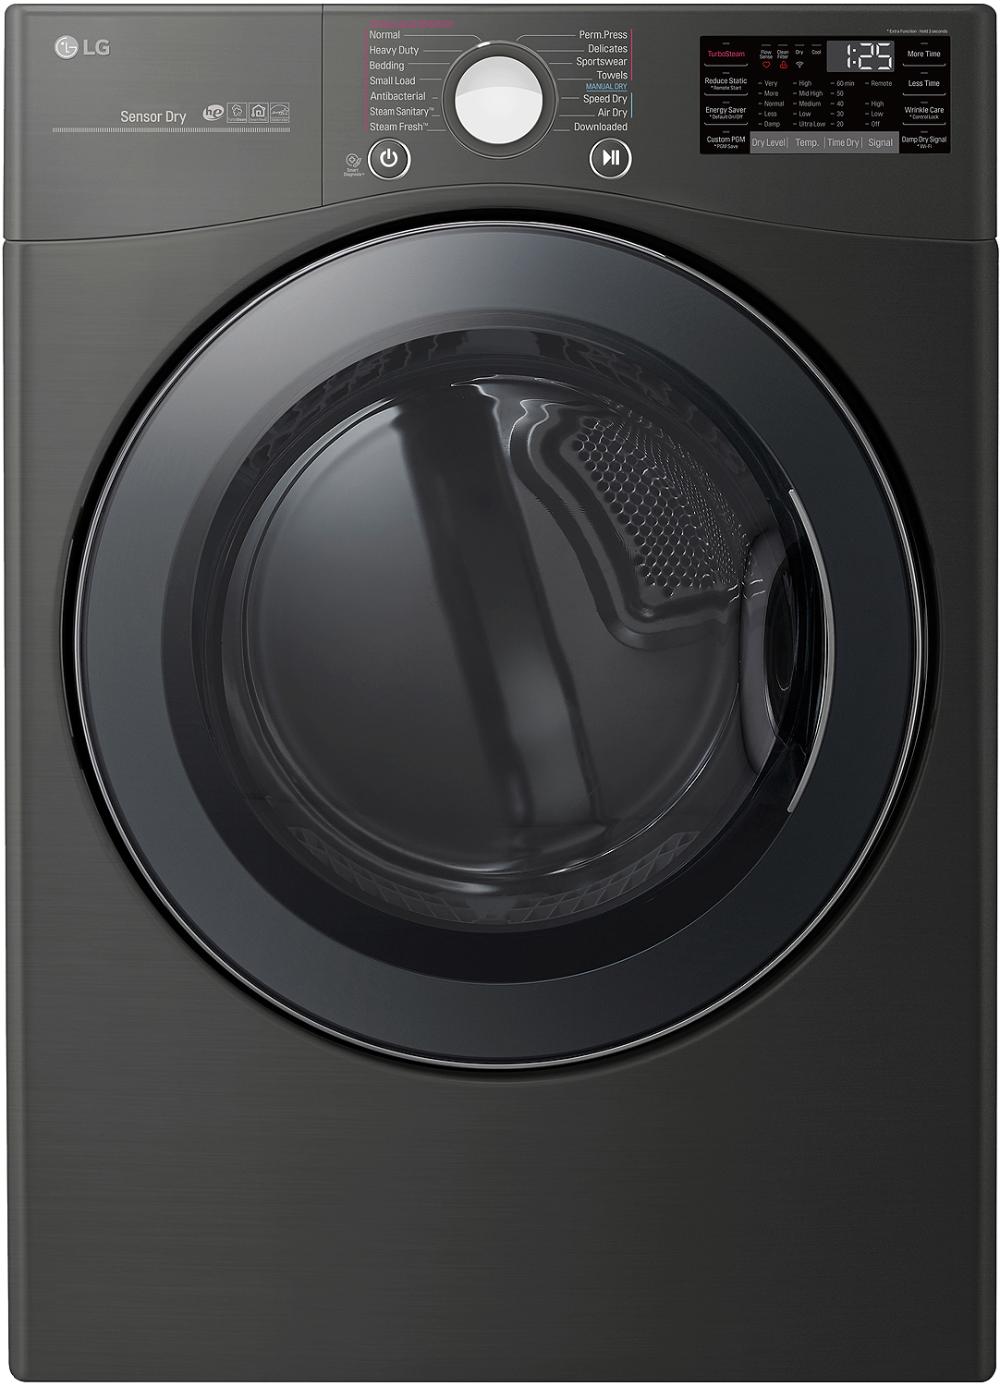 Abt Com Lg Dlgx3901b Electric Dryers Black Steel Cool Things To Buy